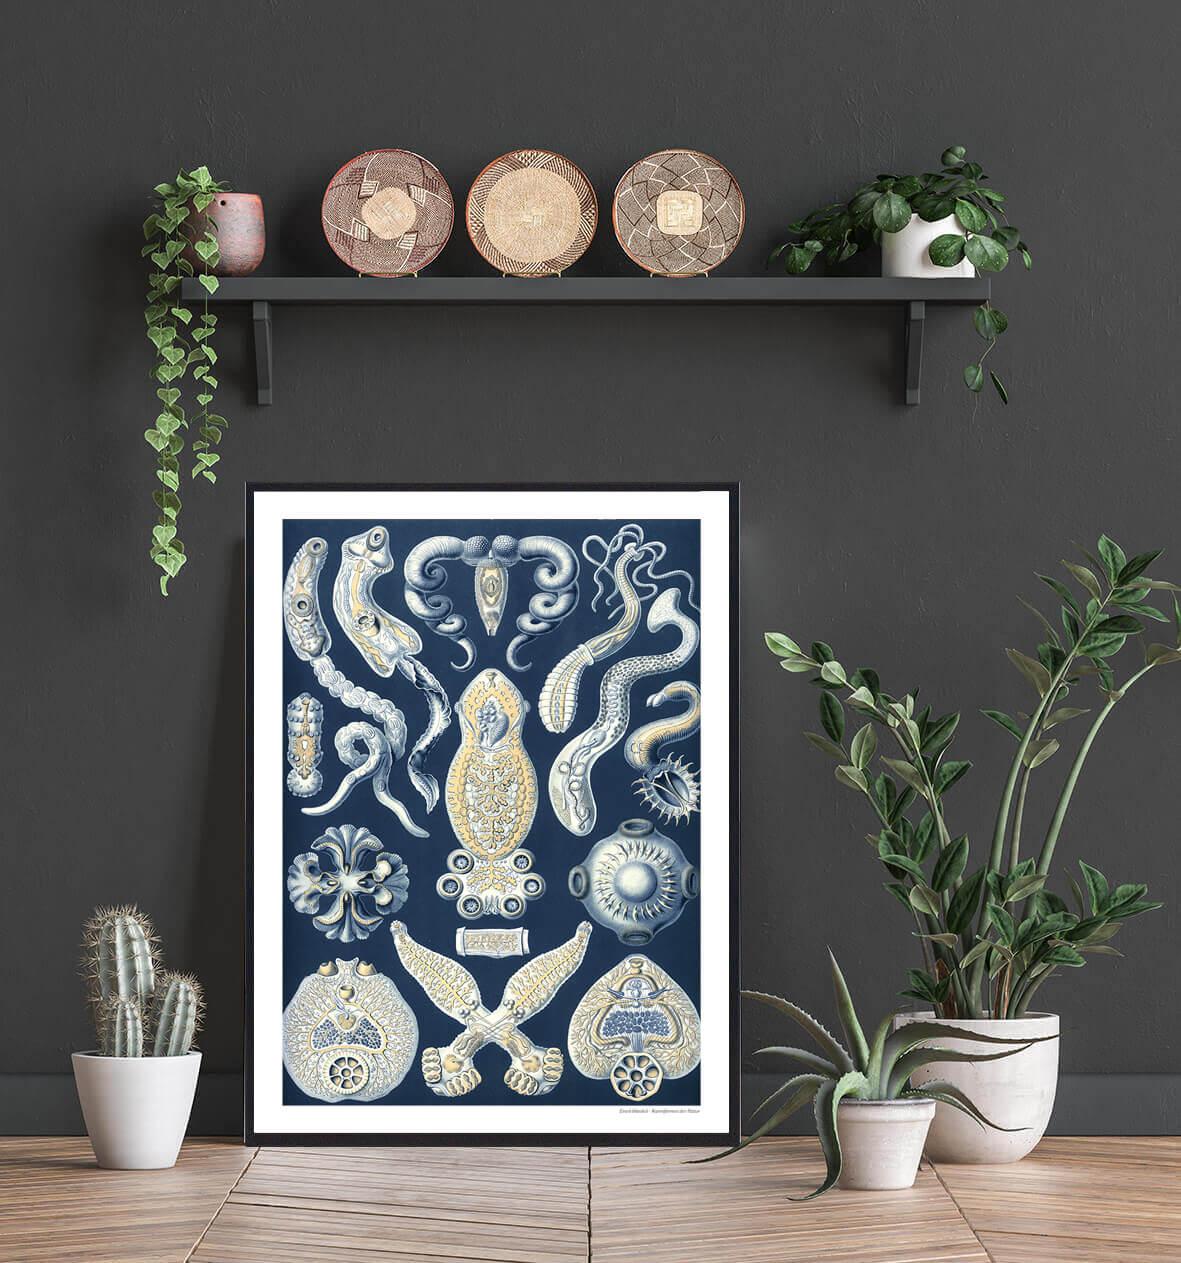 mosdyr-kunst-plakat-2